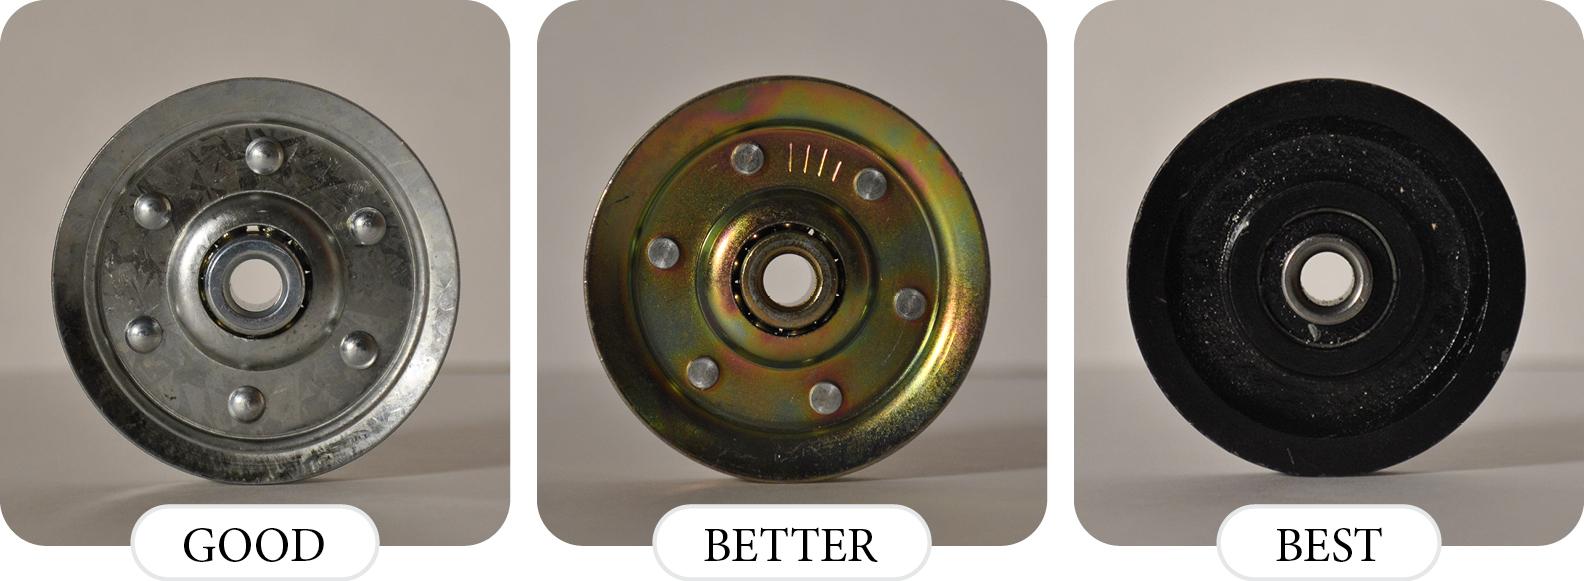 comparison of pulleys for a garage door